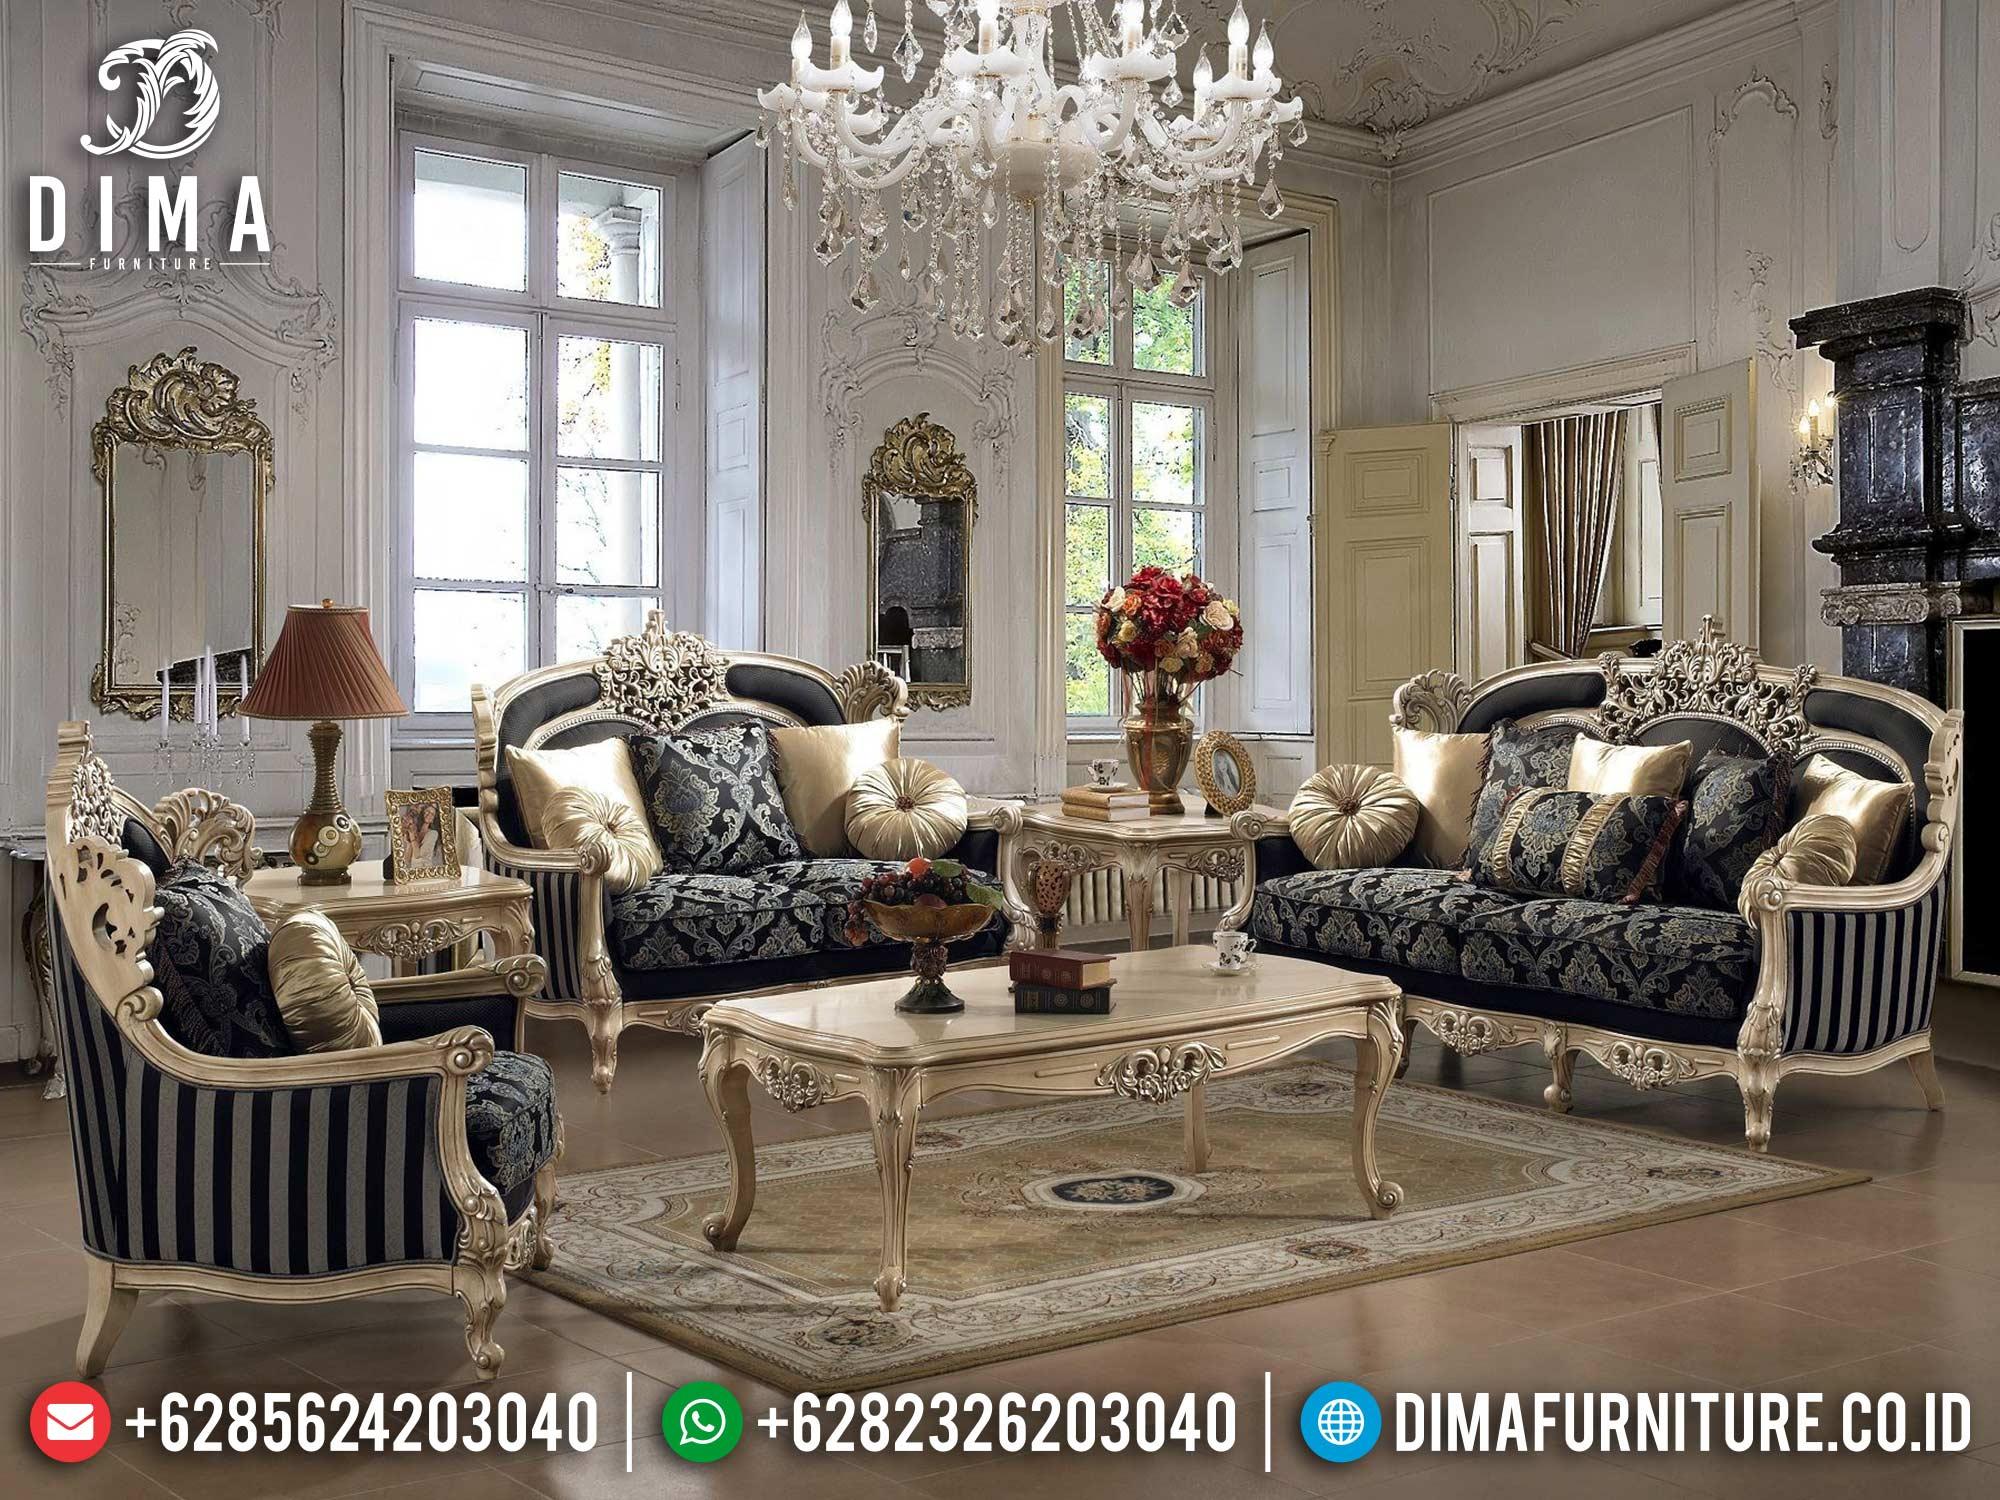 New Desain Sofa Tamu Mewah Jepara Ivory Luxury Style DF-1491